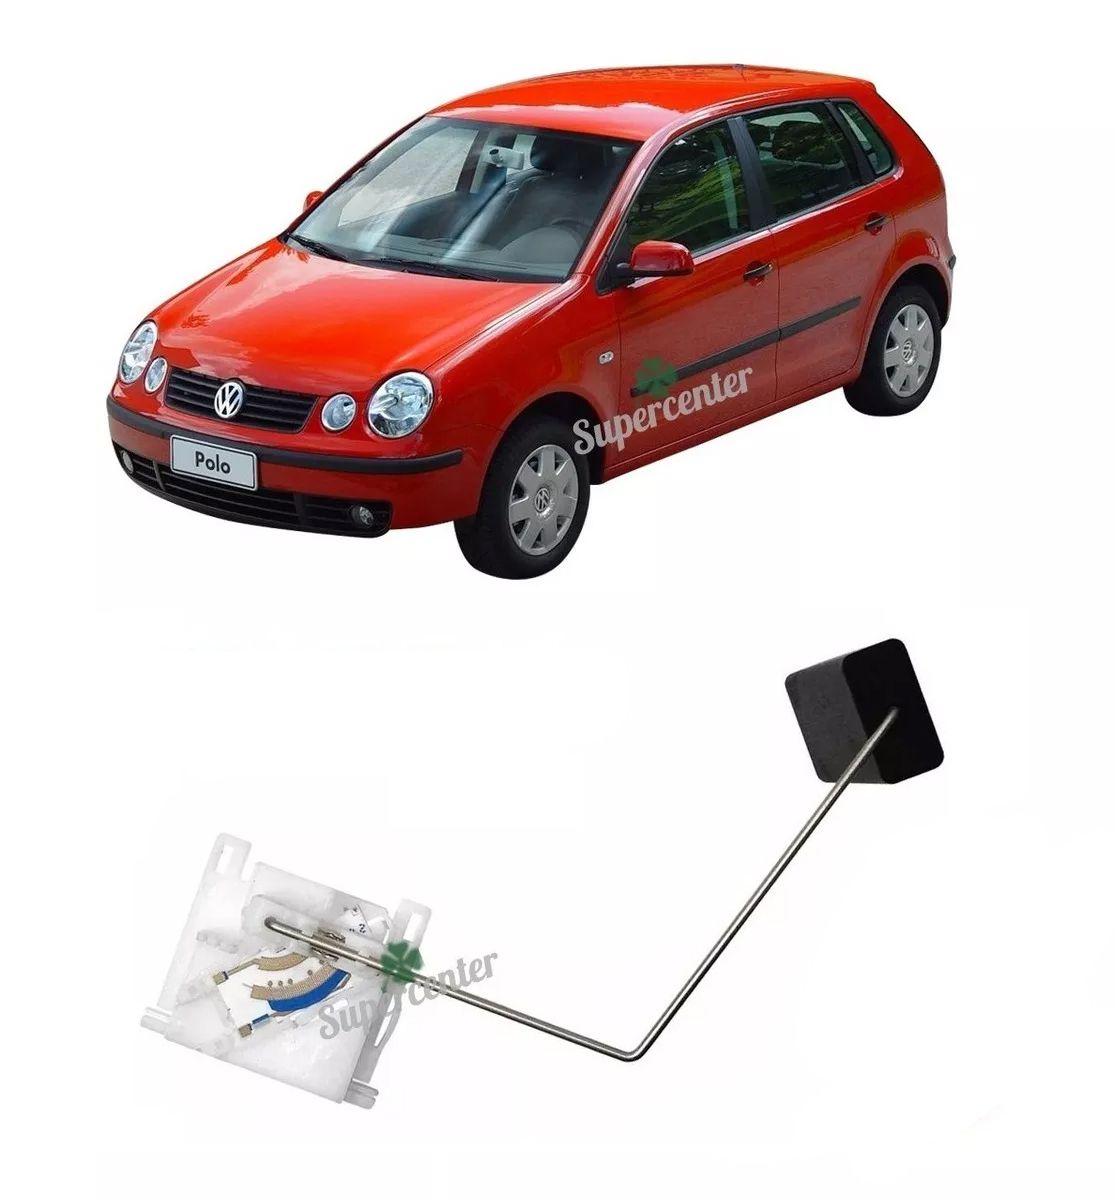 Sensor Nível Bóia Combustível Gasolina Polo 2002 A 2004